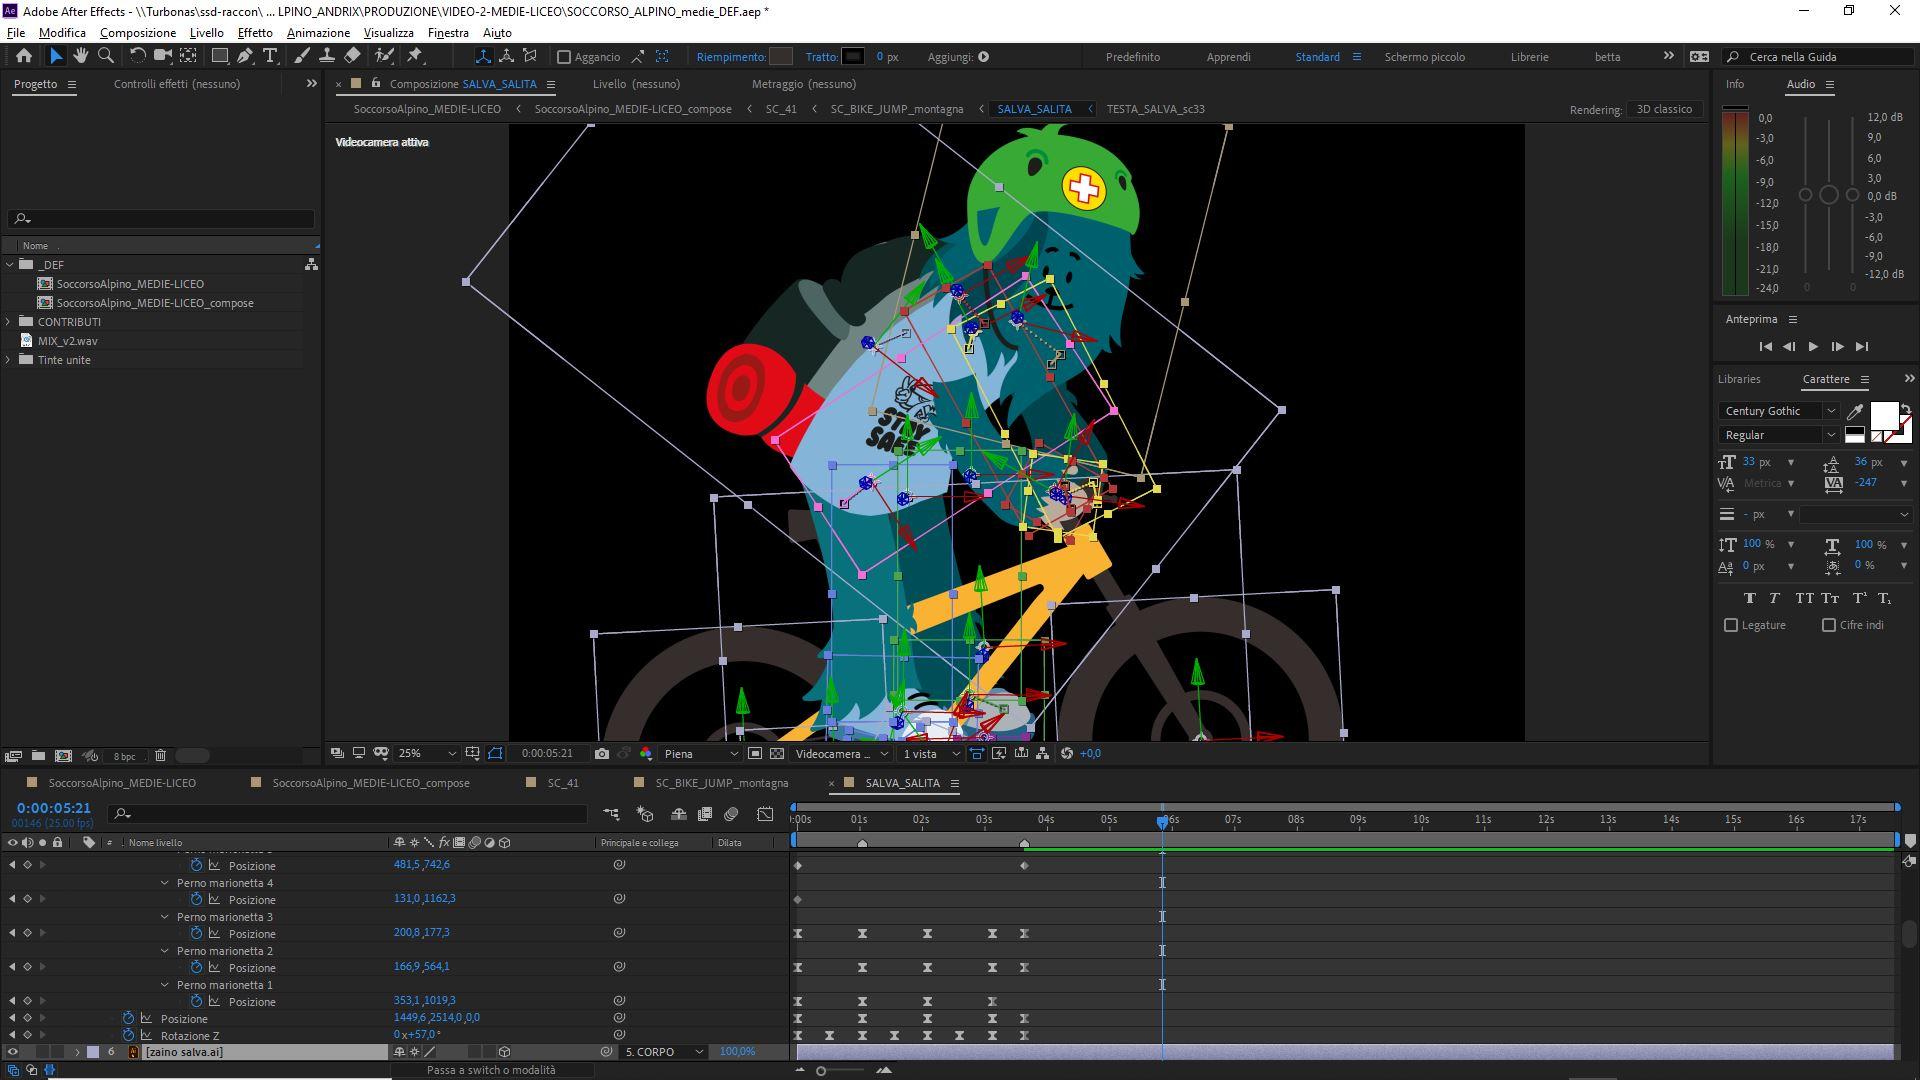 soccorso_alpino_animation_character_racoonstudio_motion_design_12